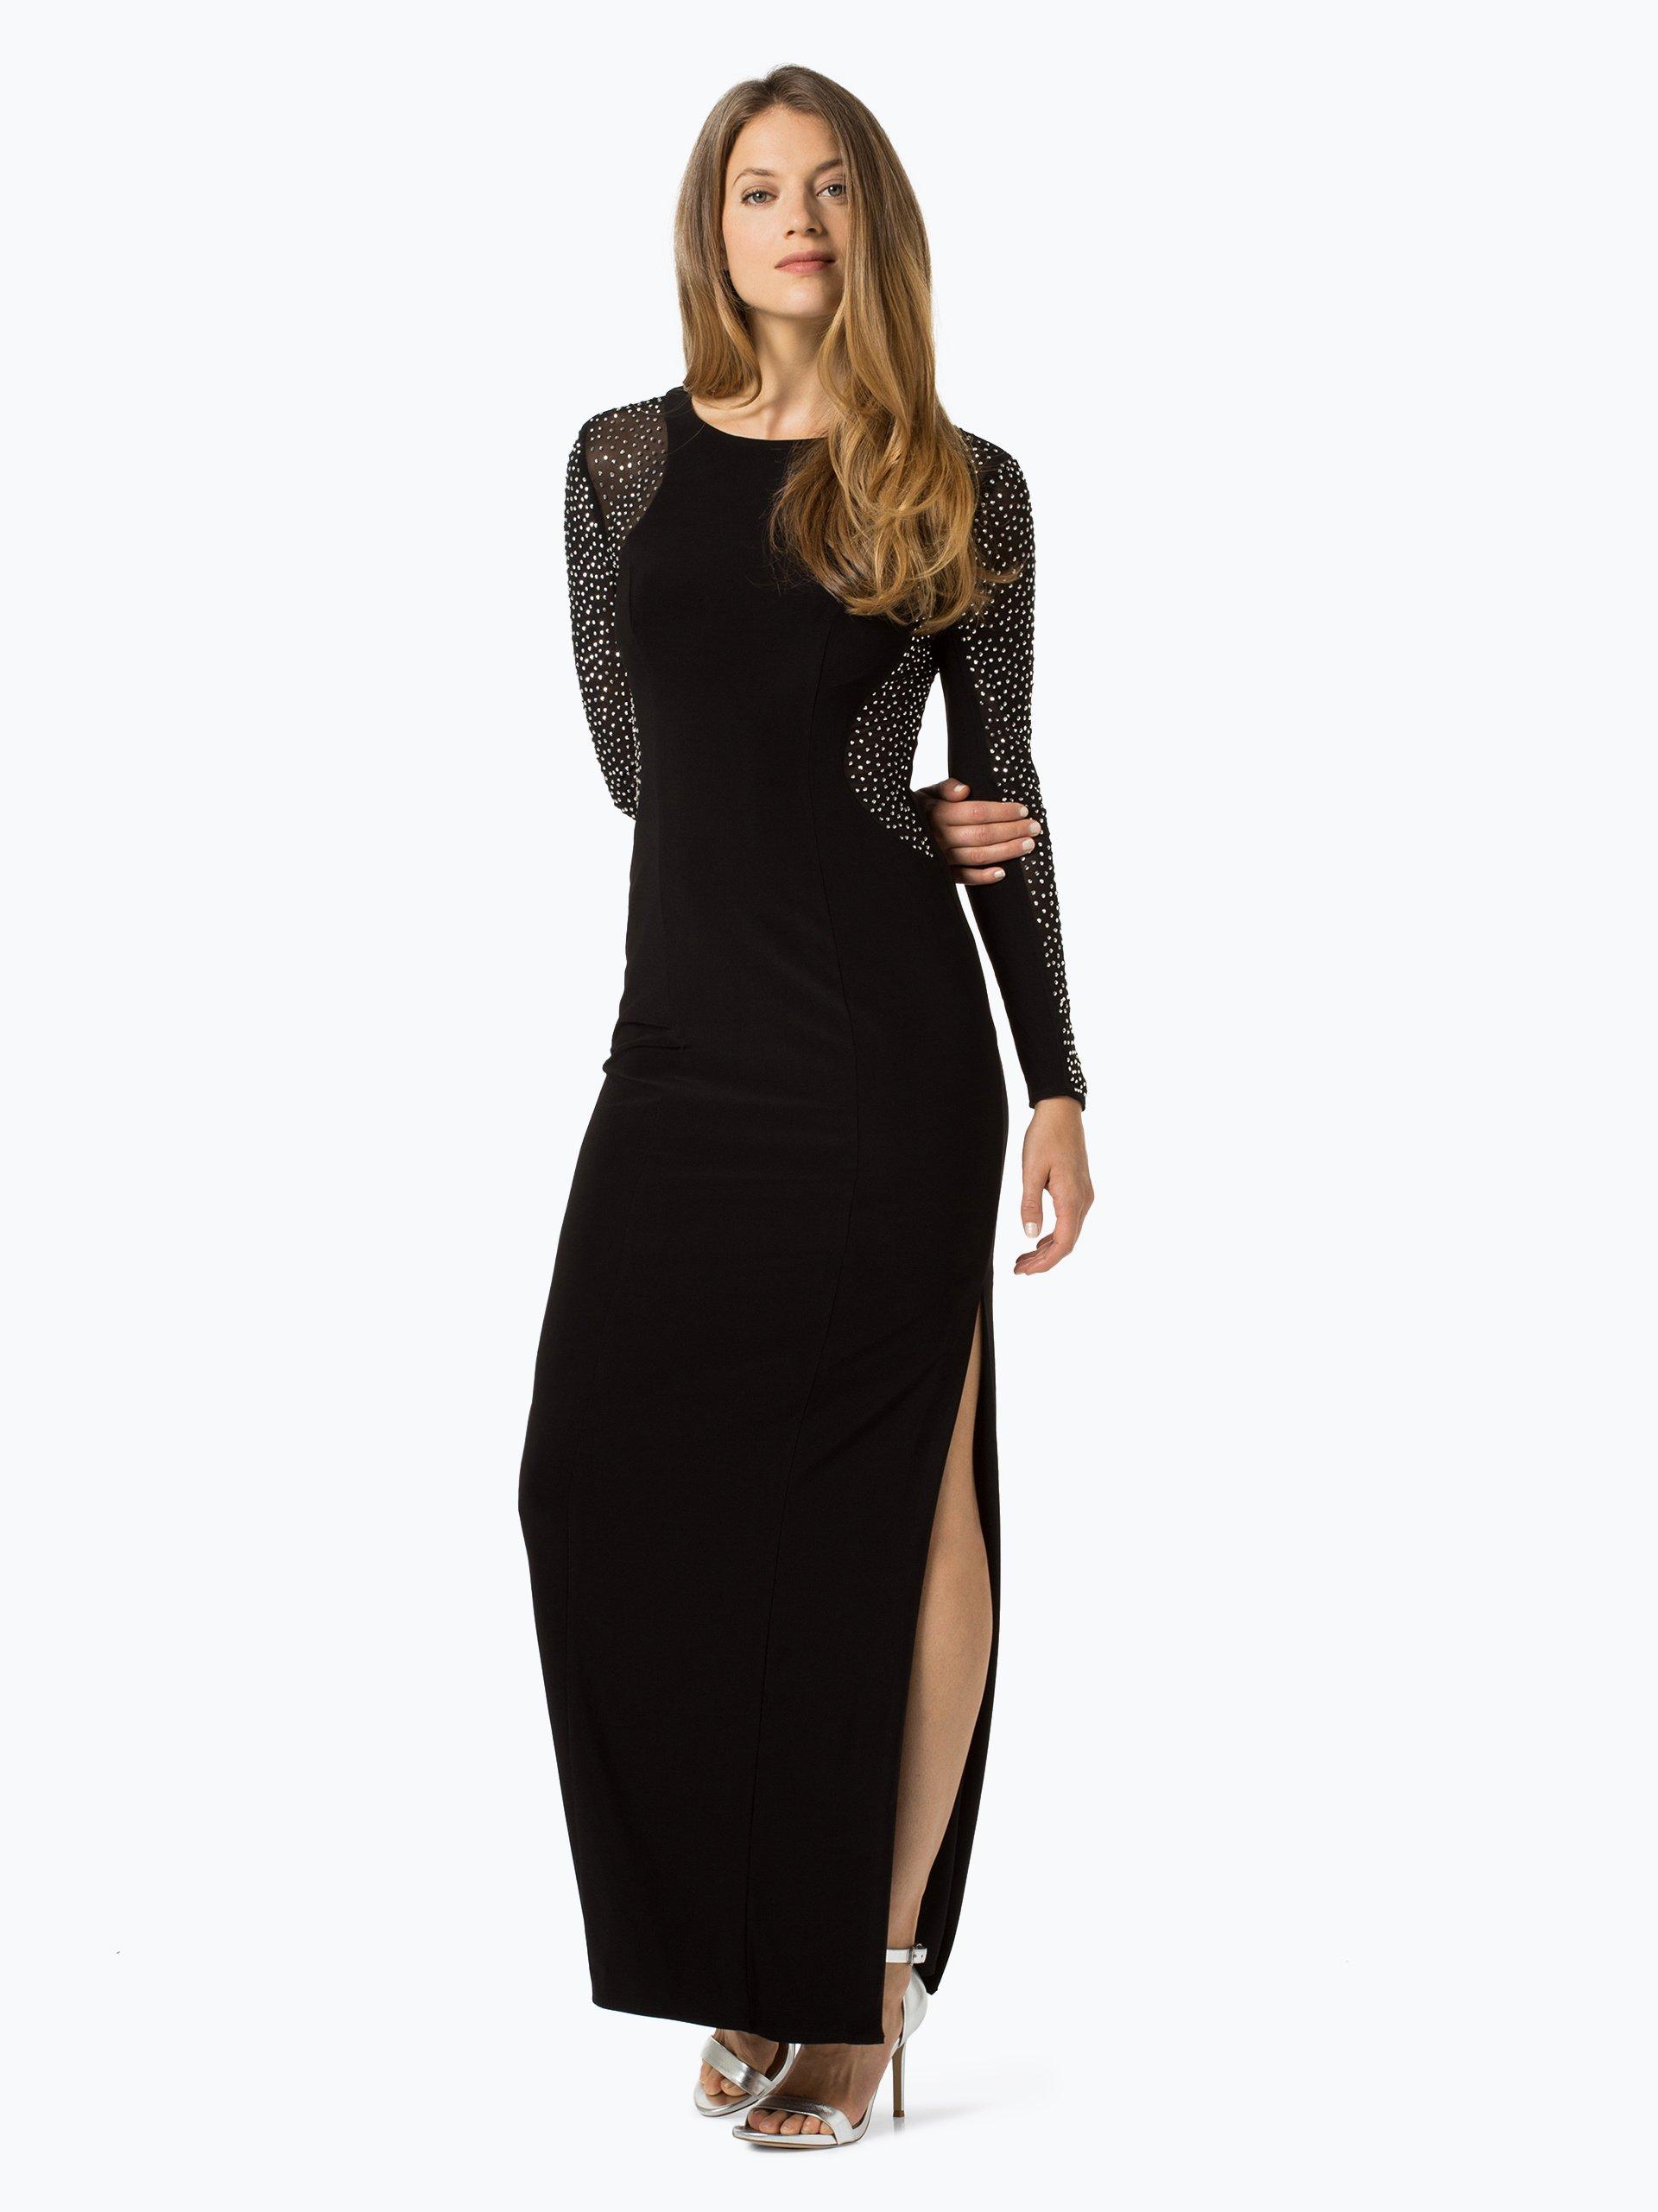 Apriori Damska sukienka wieczorowa